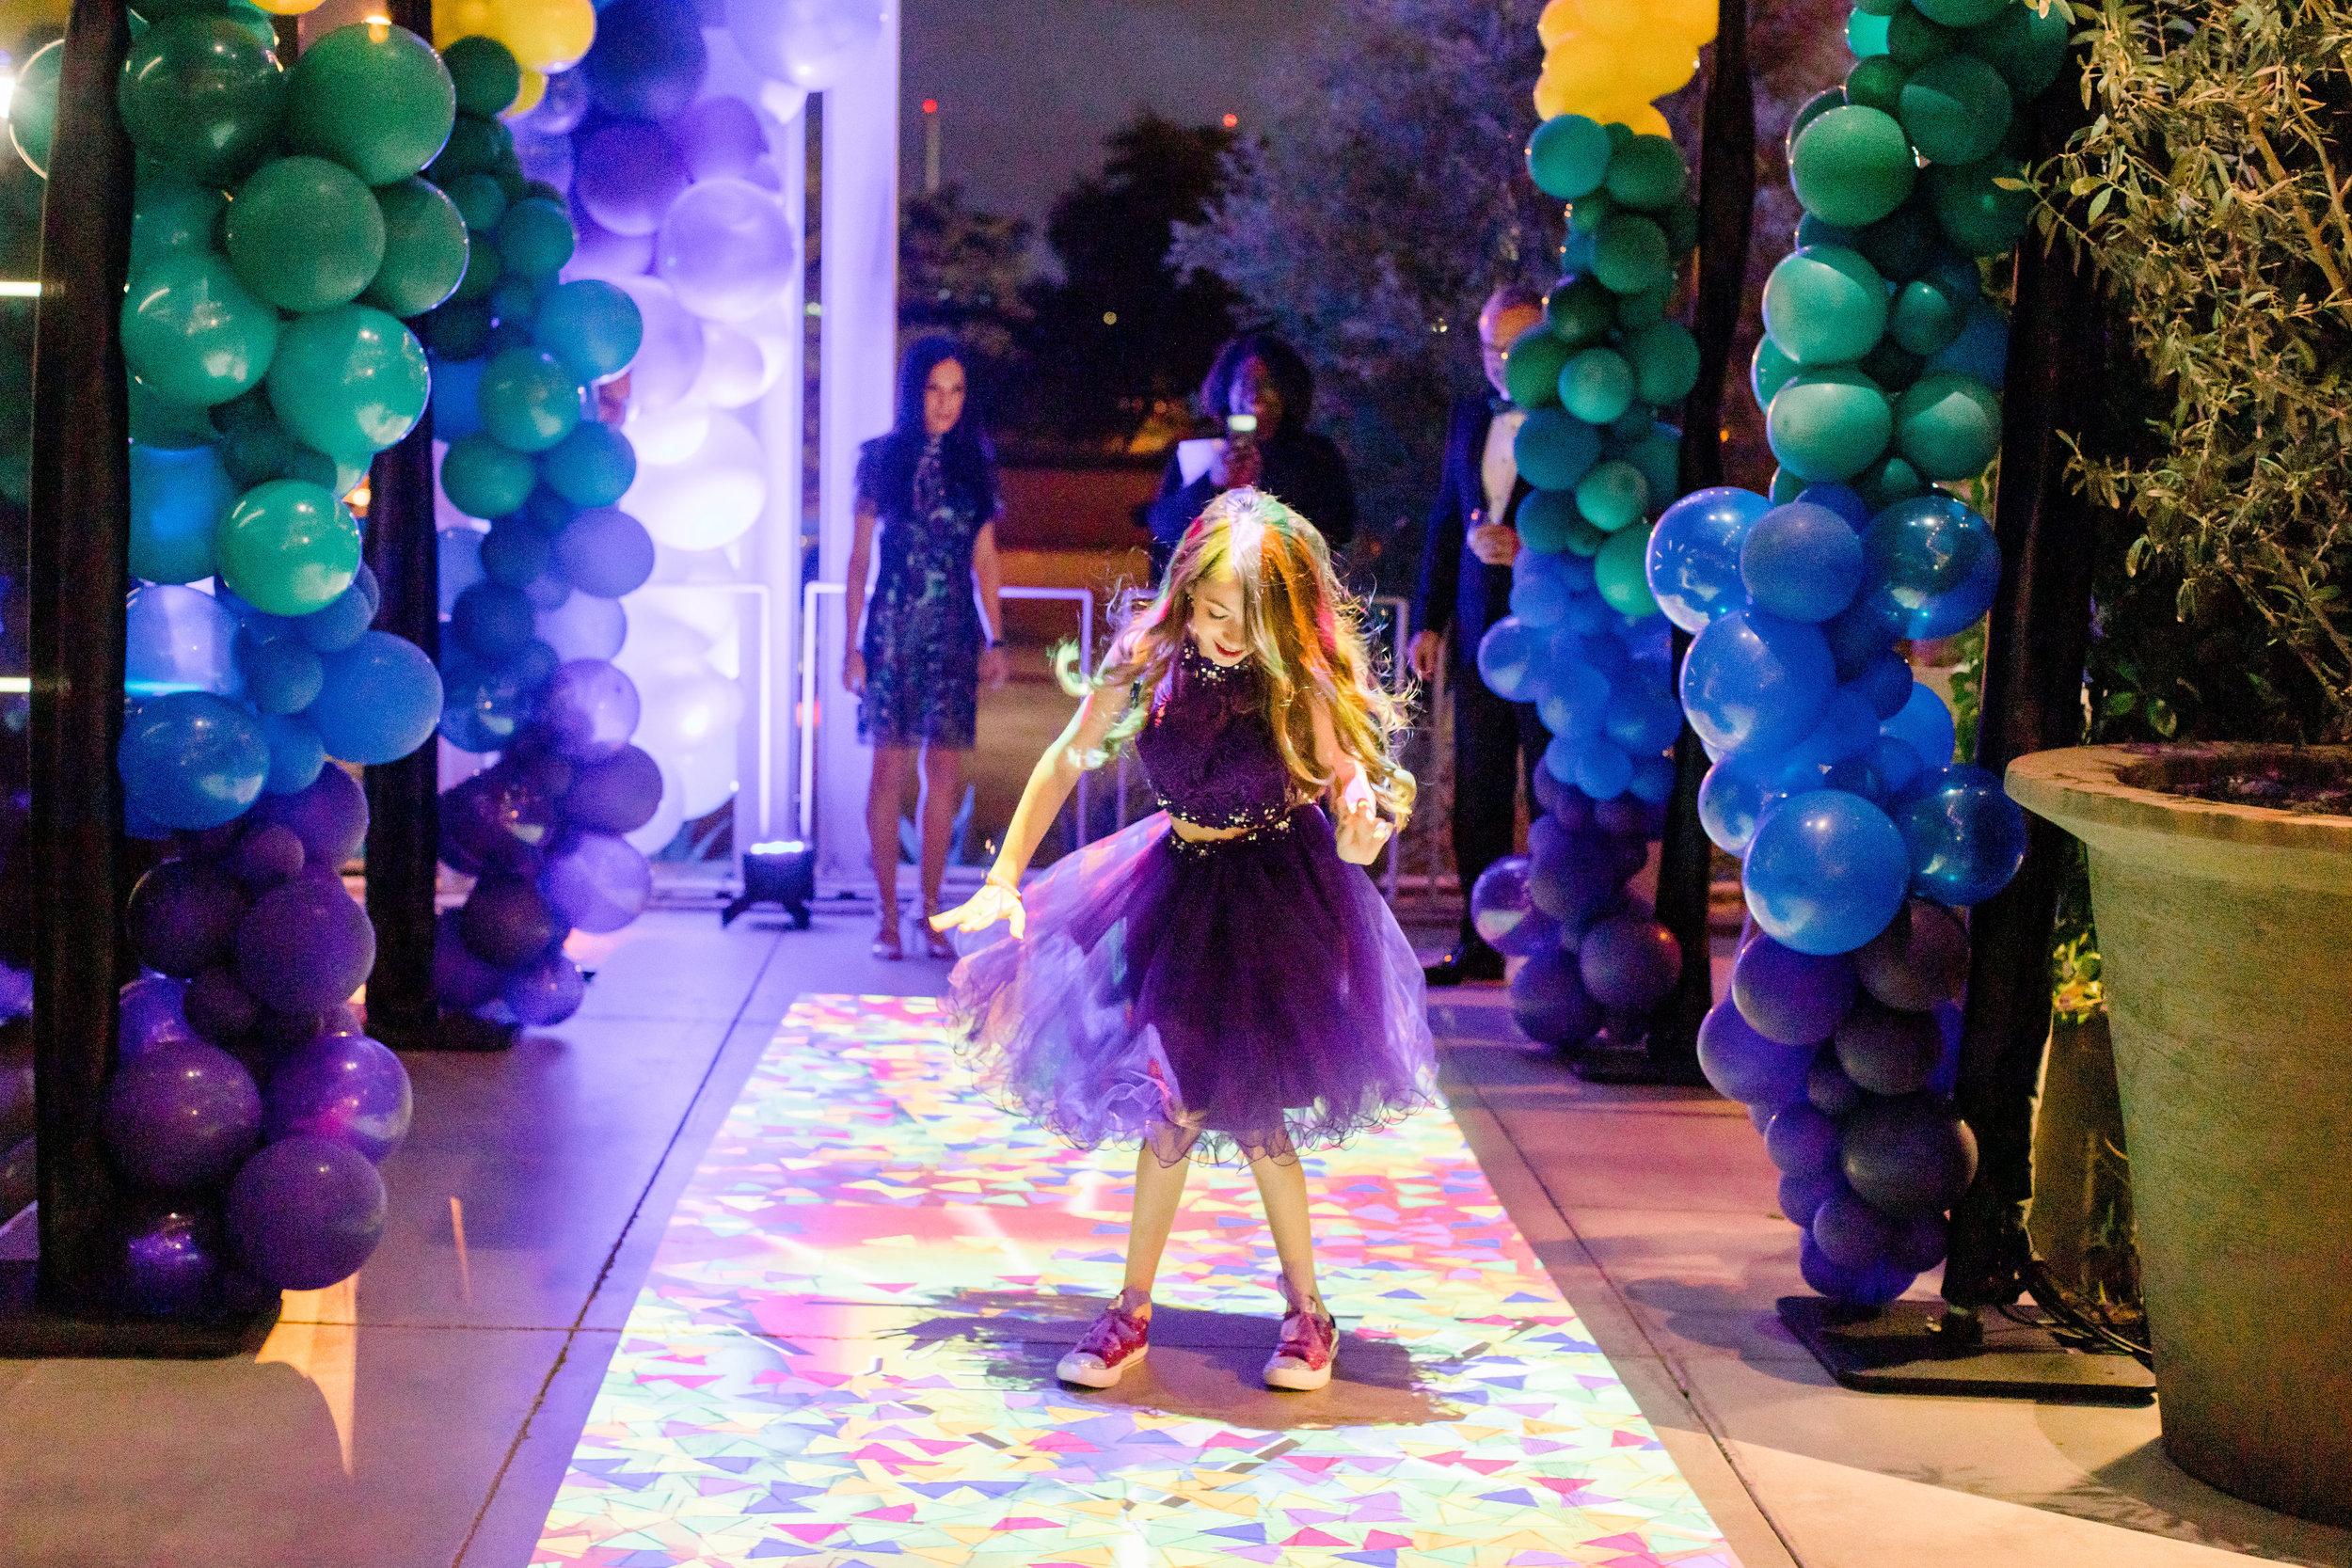 54 rainbow bat mitzvah party rainbow balloon columns custom interactive light projection game purple tulle skirt bat mitzvah entertainment Life Design Events photos by Stephanie Heymann Photography.jpg